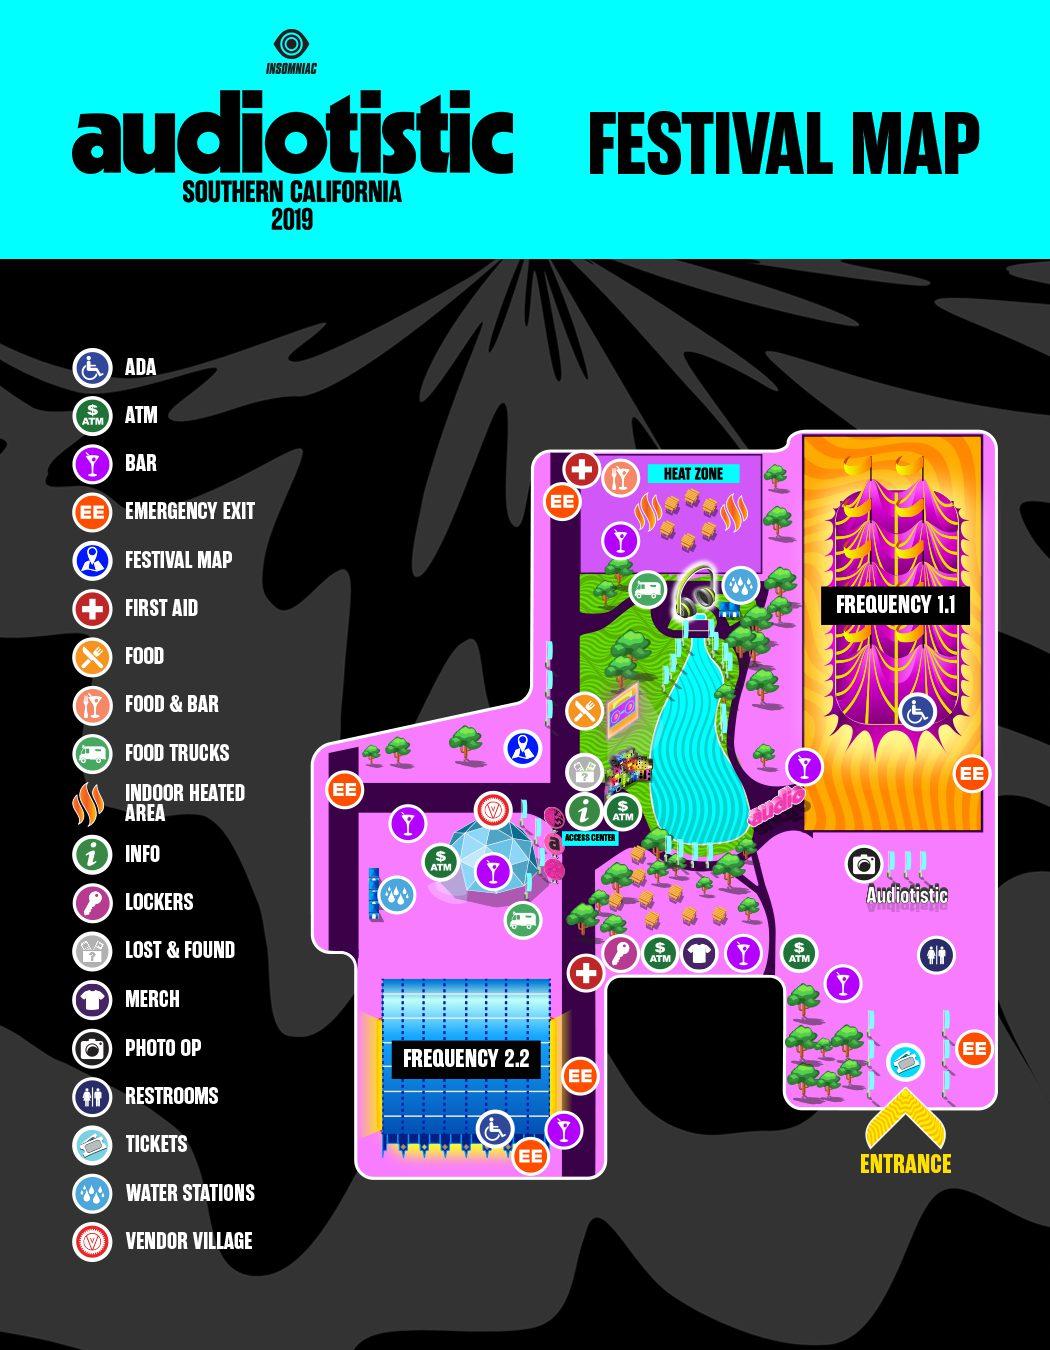 Audiotistic SoCal 2019 Festival Map